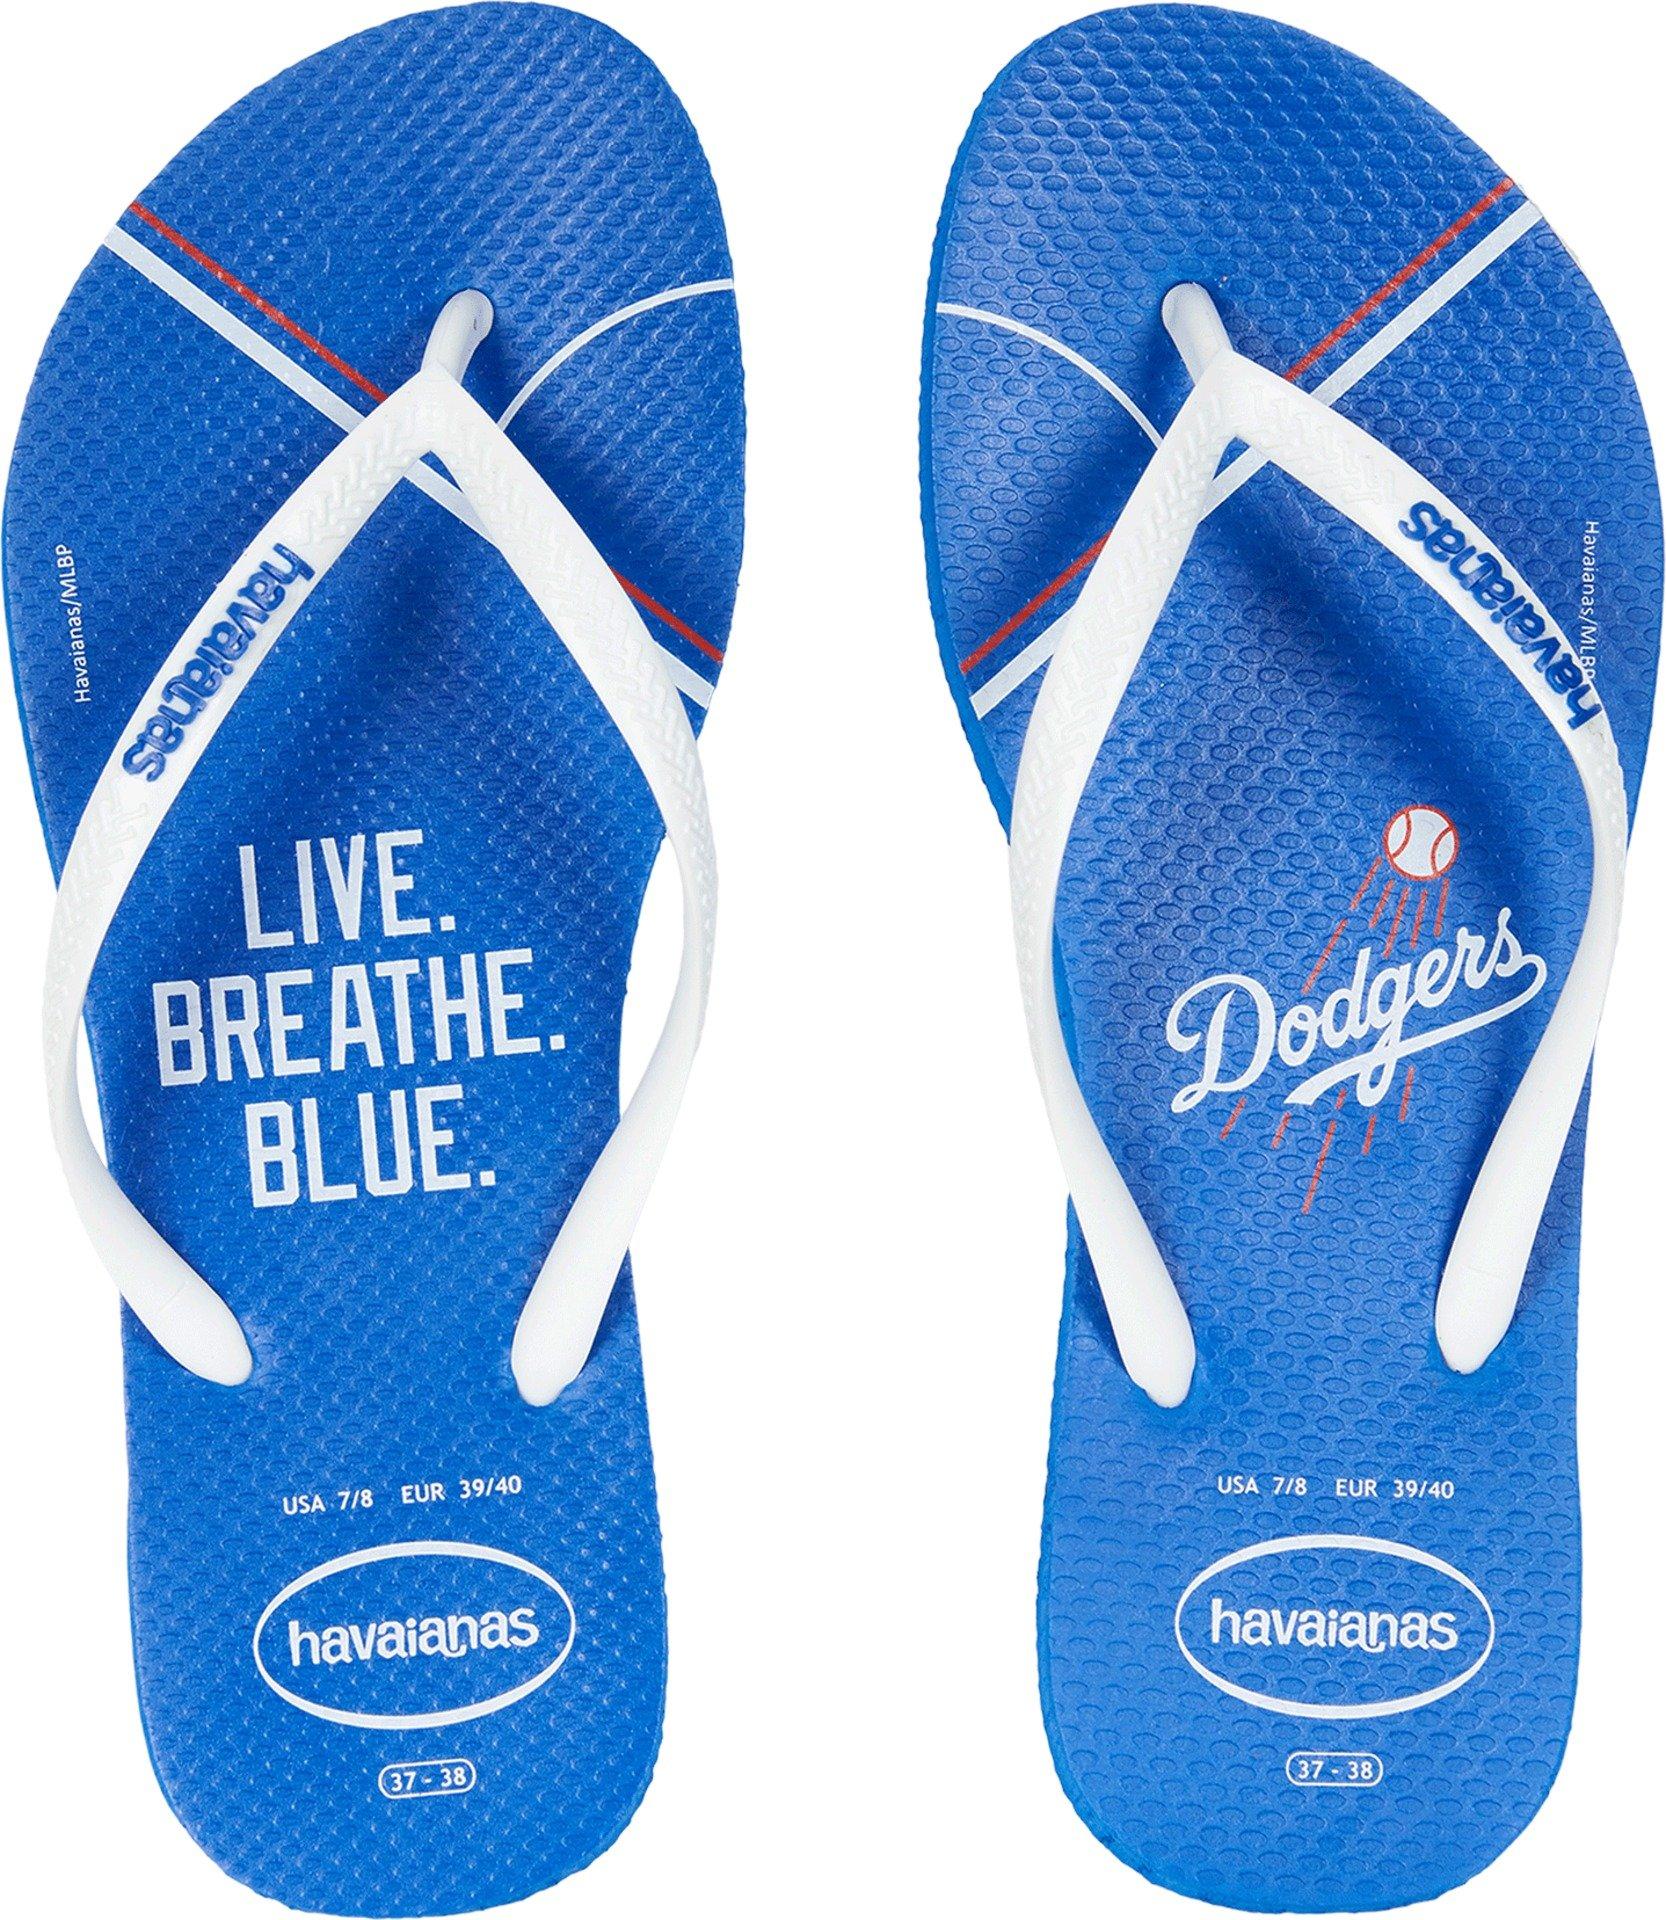 Havaianas Unisex Slim MLB Los Angeles Dodgers Sandal (39-40 M Bra, Blue Star)